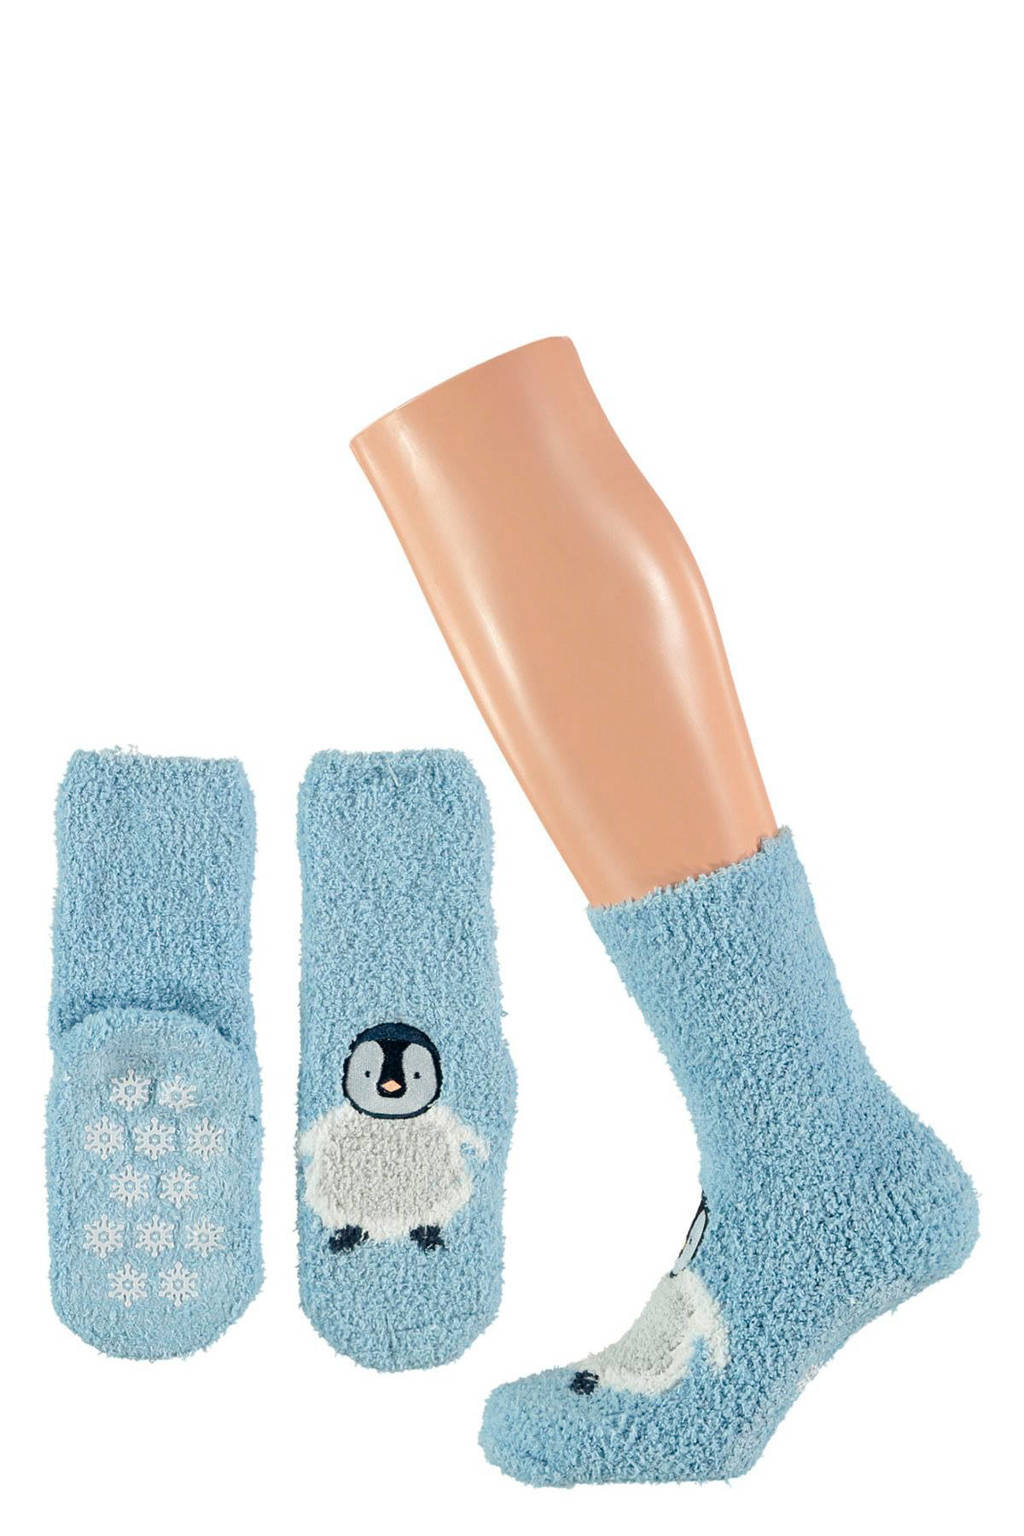 Apollo giftbox sokken kerst kids blauw, Pinguin